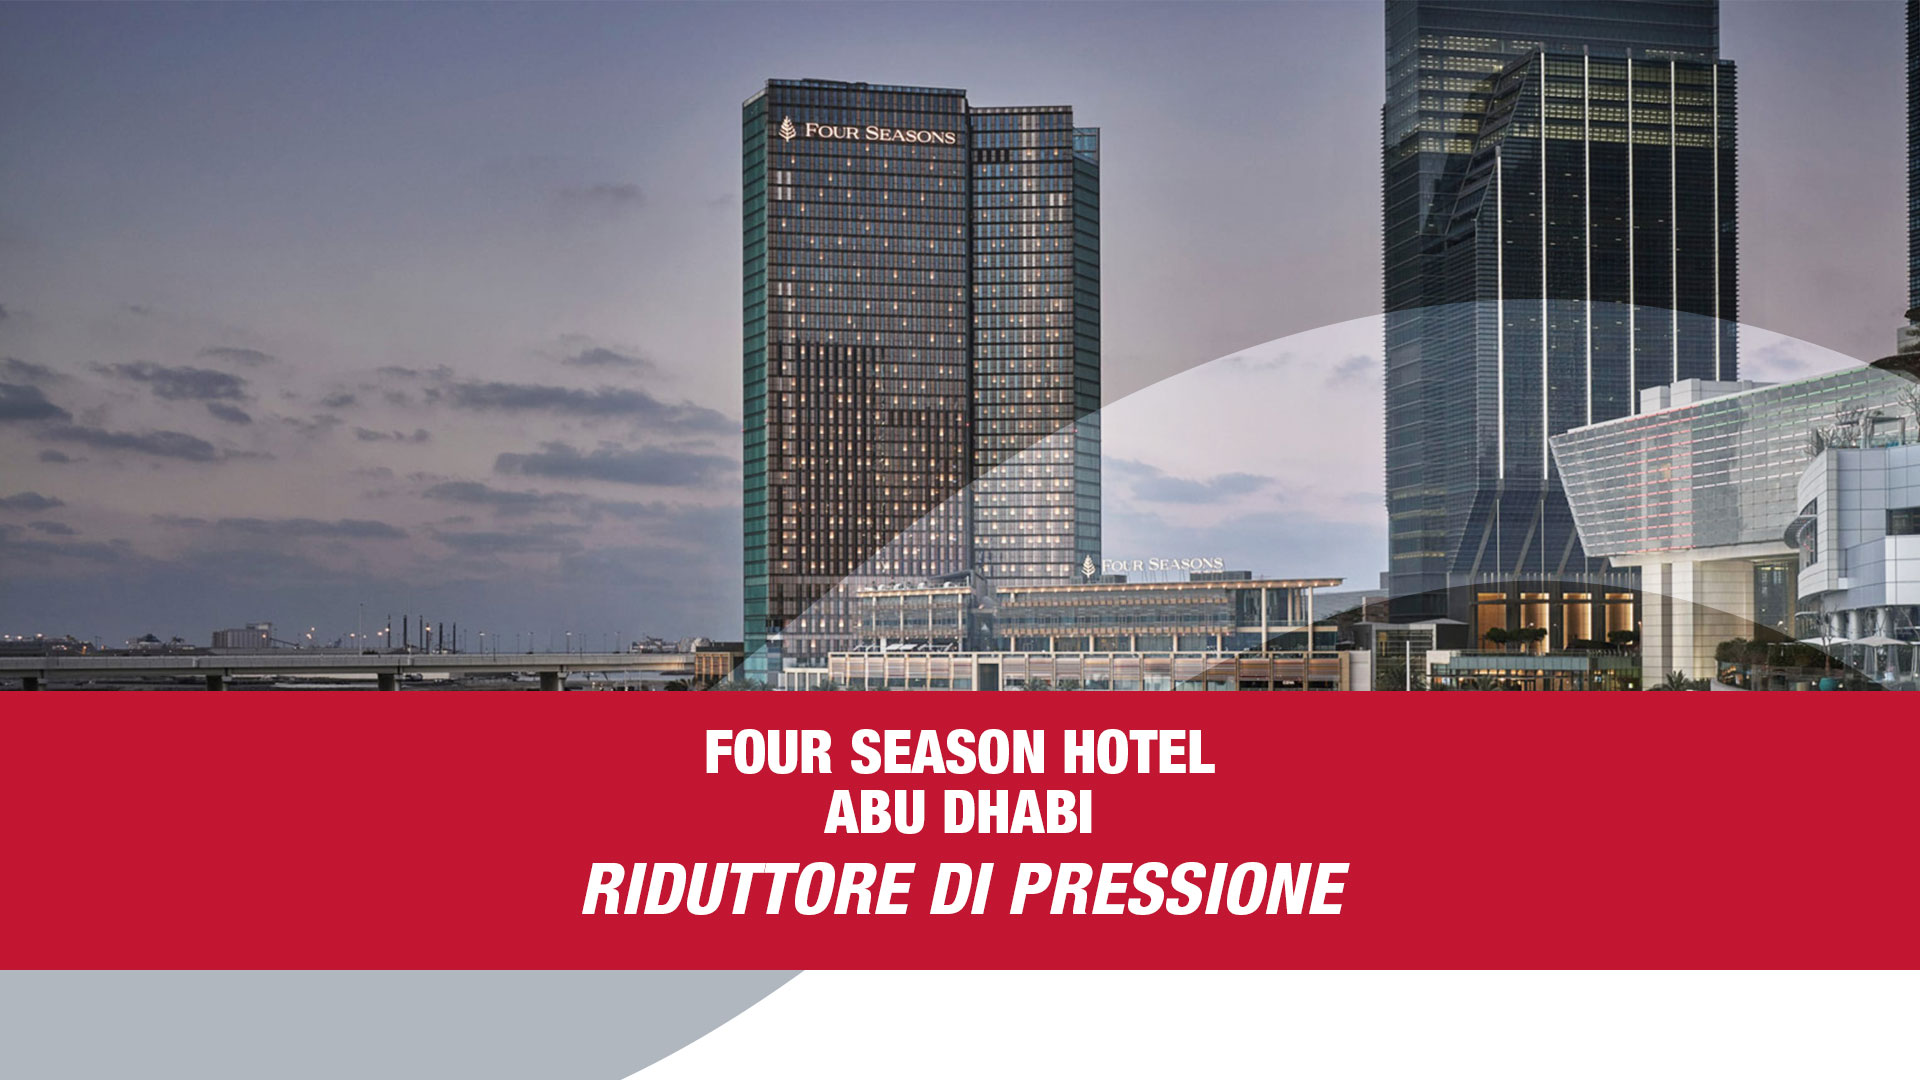 Portfolio - Four season hotel Abu Dhabi